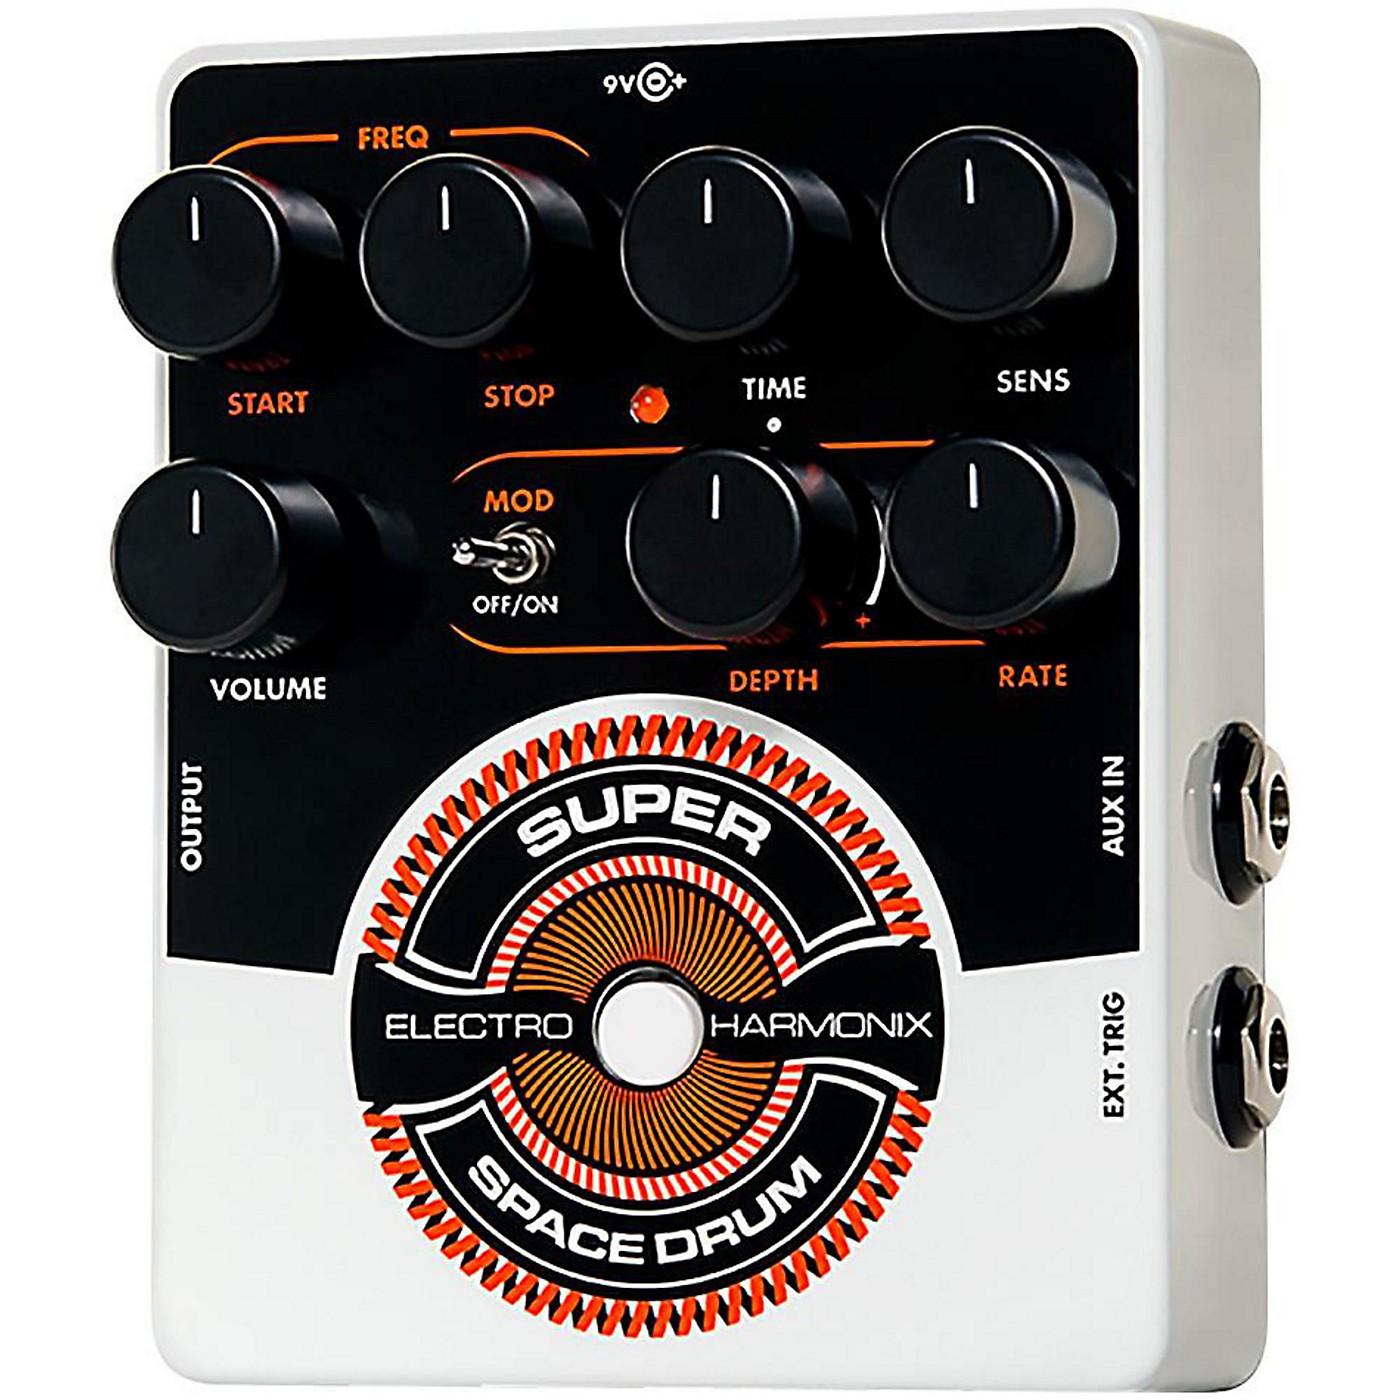 Electro-Harmonix Super Space Drum Analog Drum Synth Pedal thumbnail